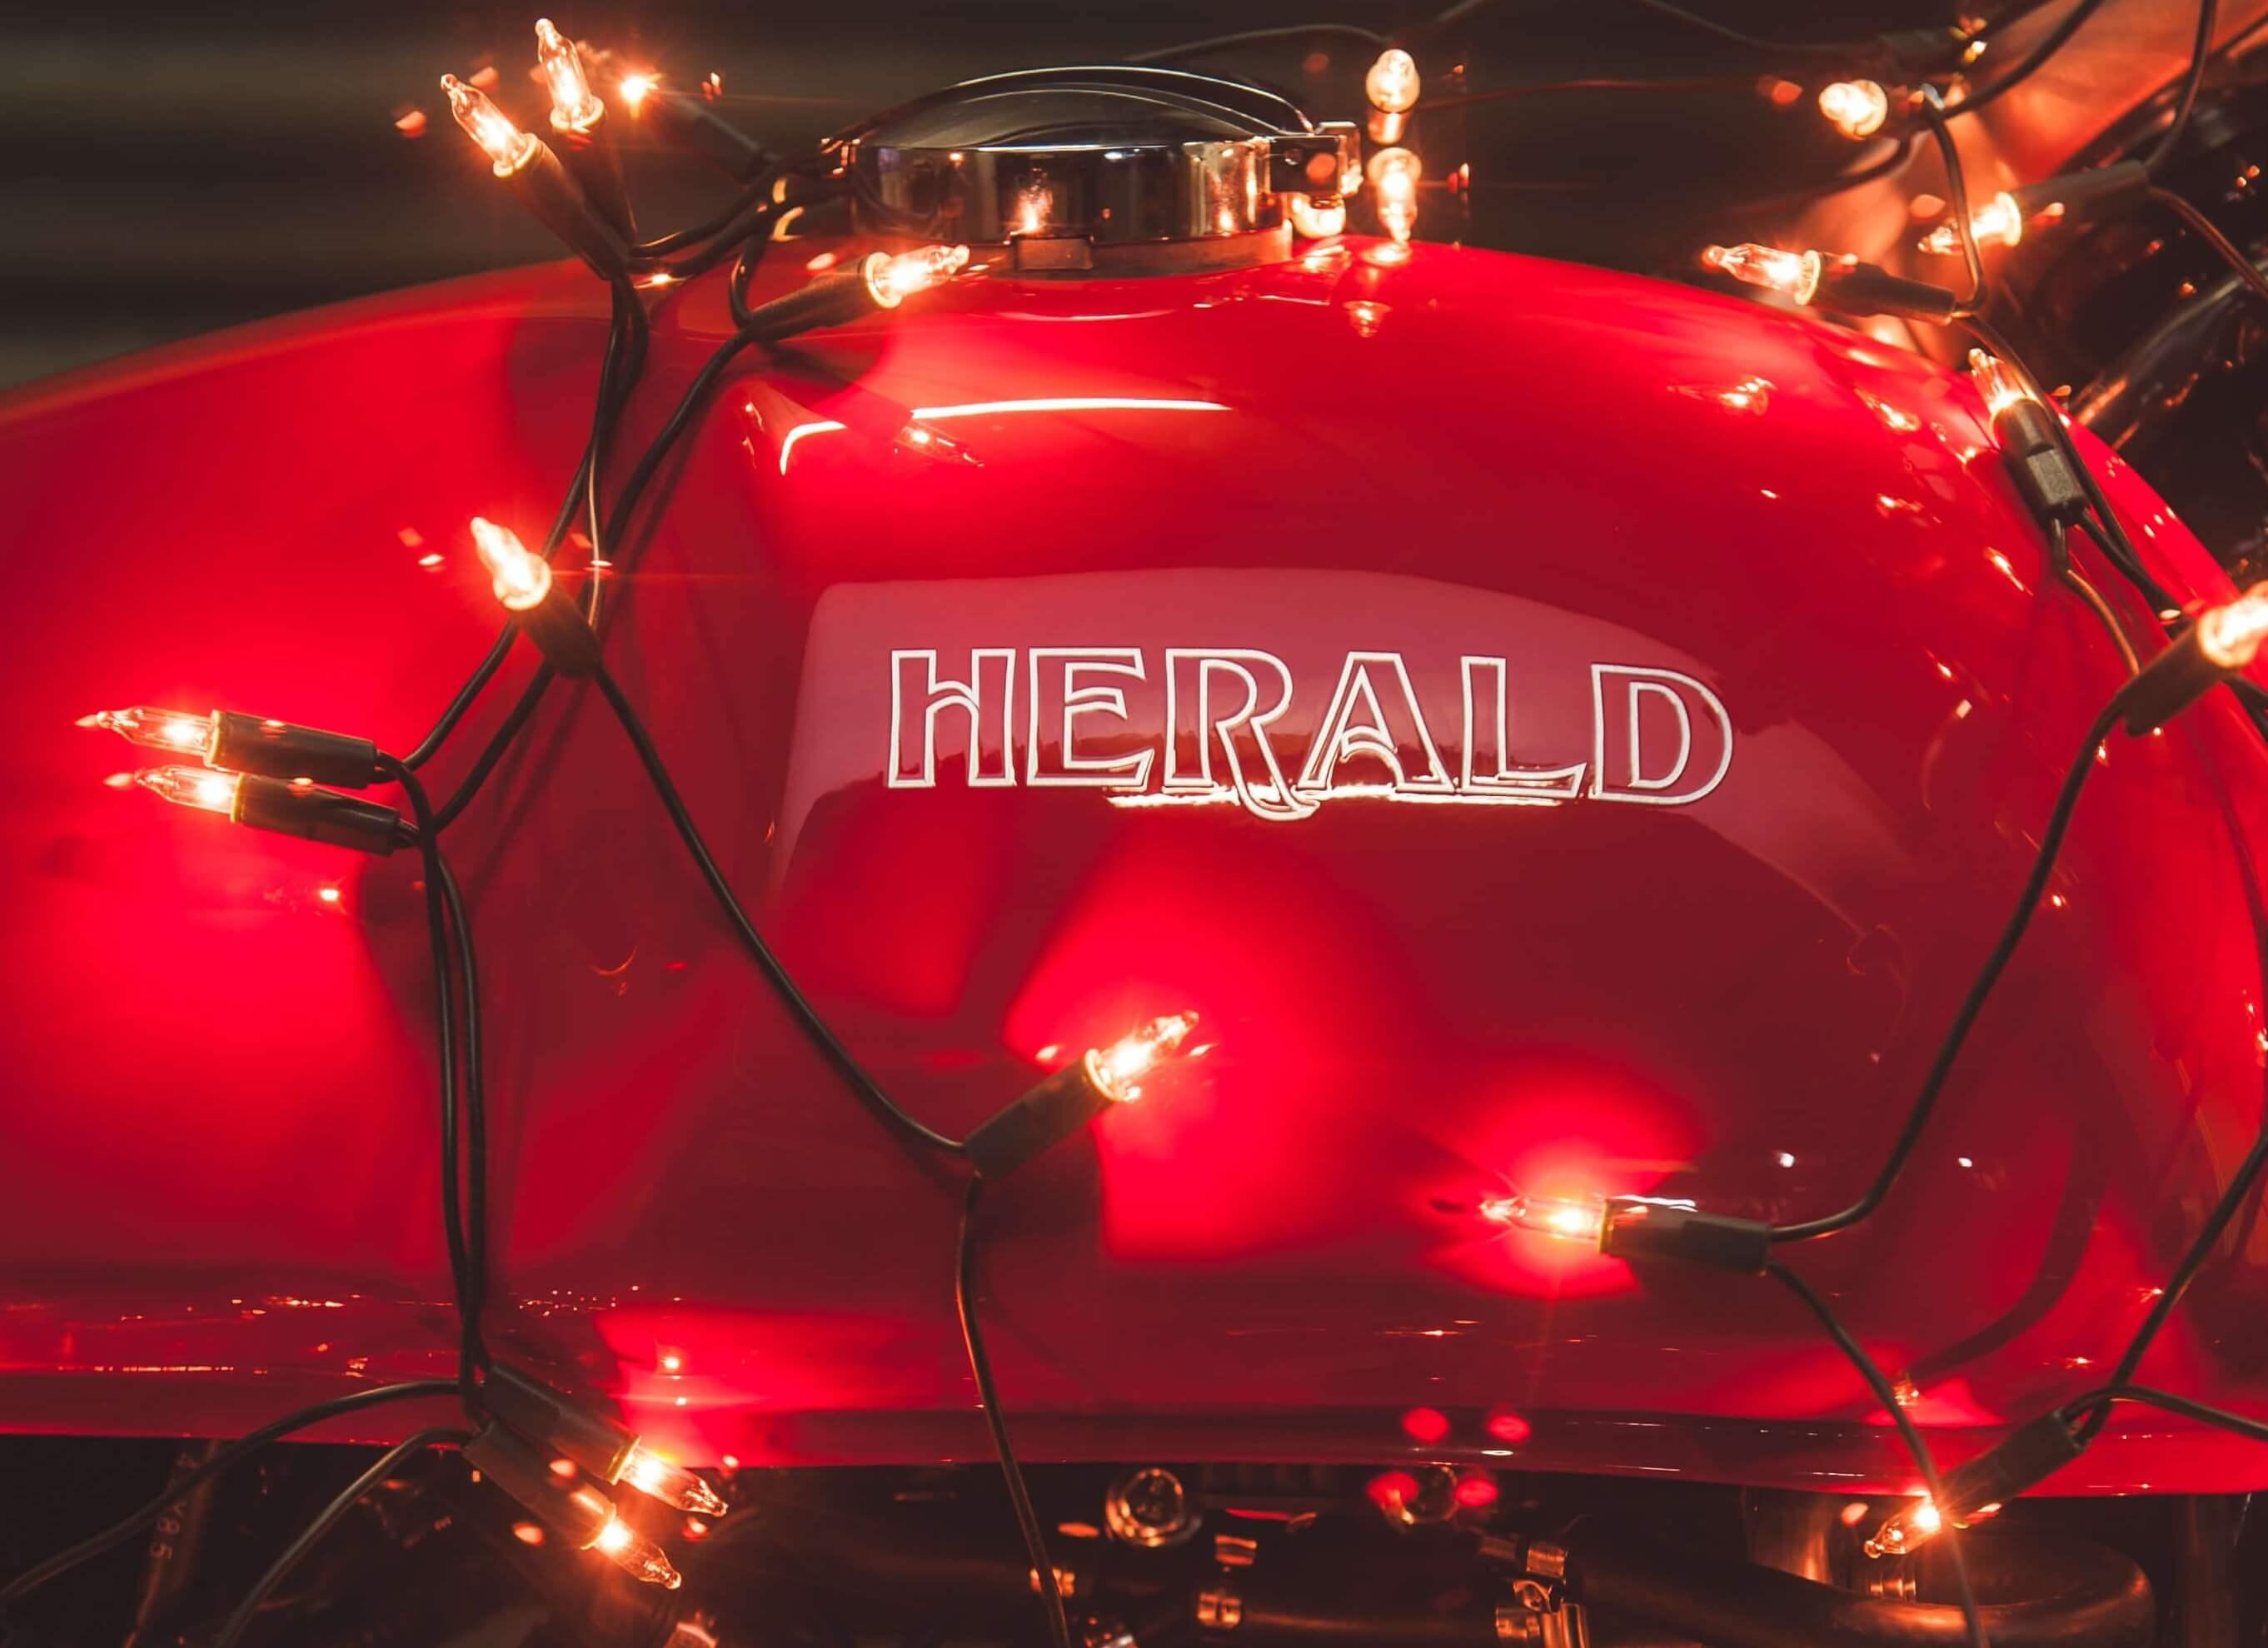 Herald rollercoaster